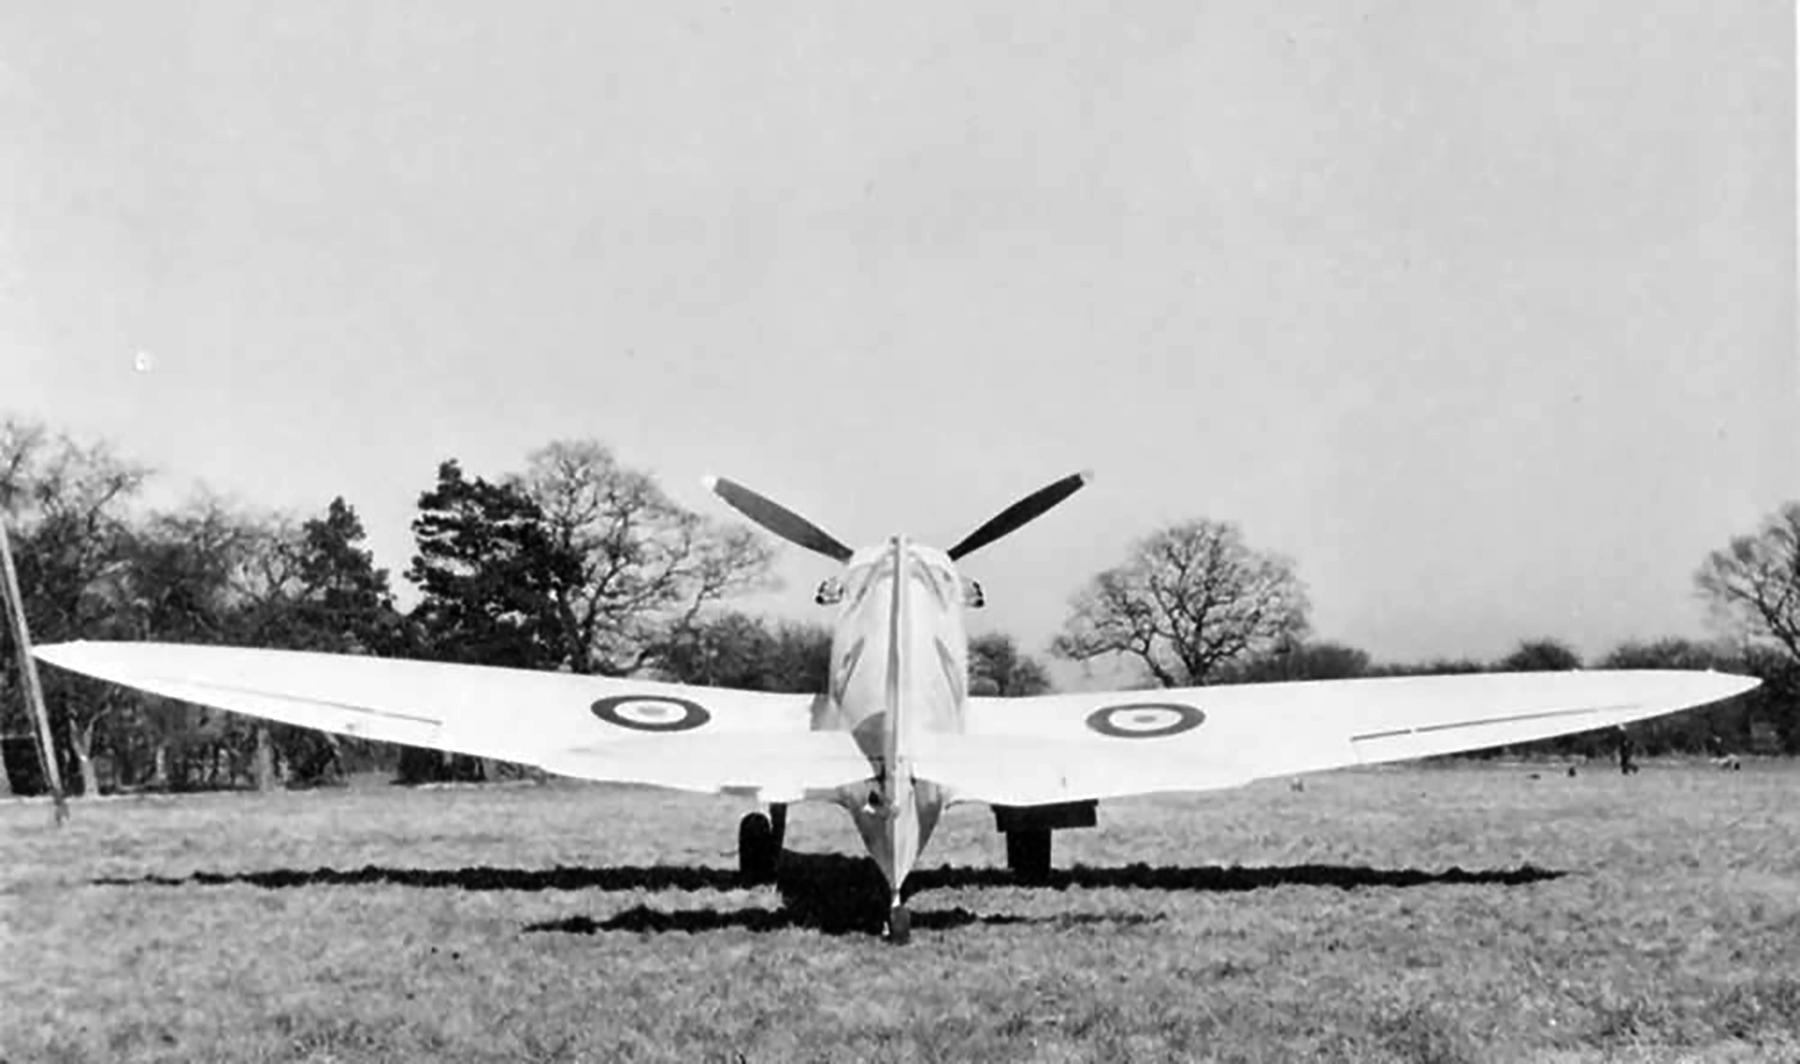 Spitfire PRI RAF 1PRU Photographic Reconnaissance Unit code LY web 02